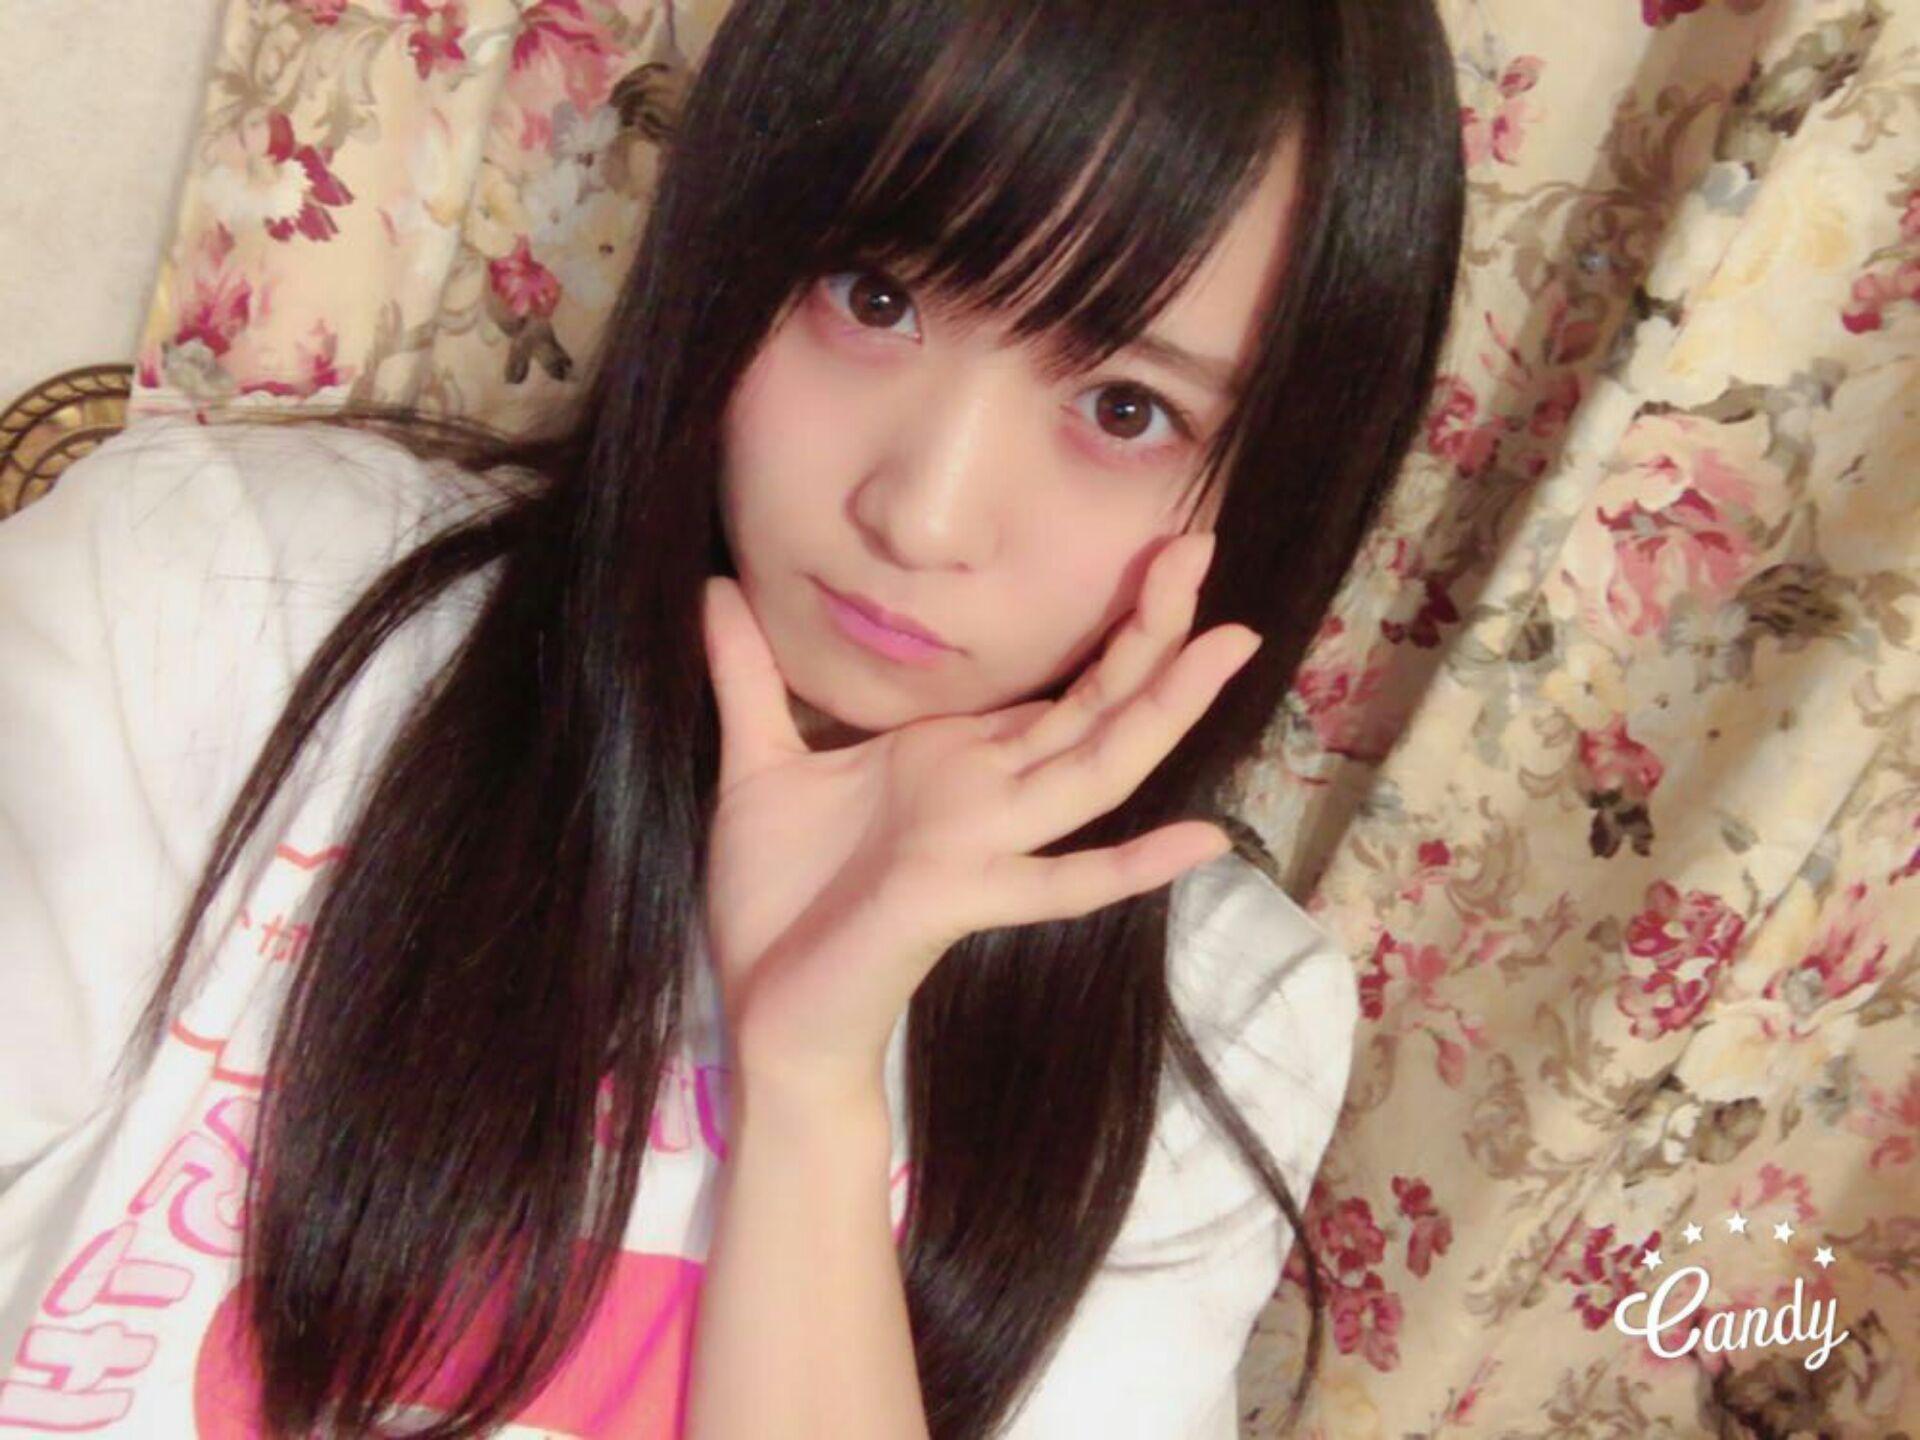 https://i1.wp.com/stat.7gogo.jp/appimg_images/20161214/22/3d/aN/j/o19201440p.jpg